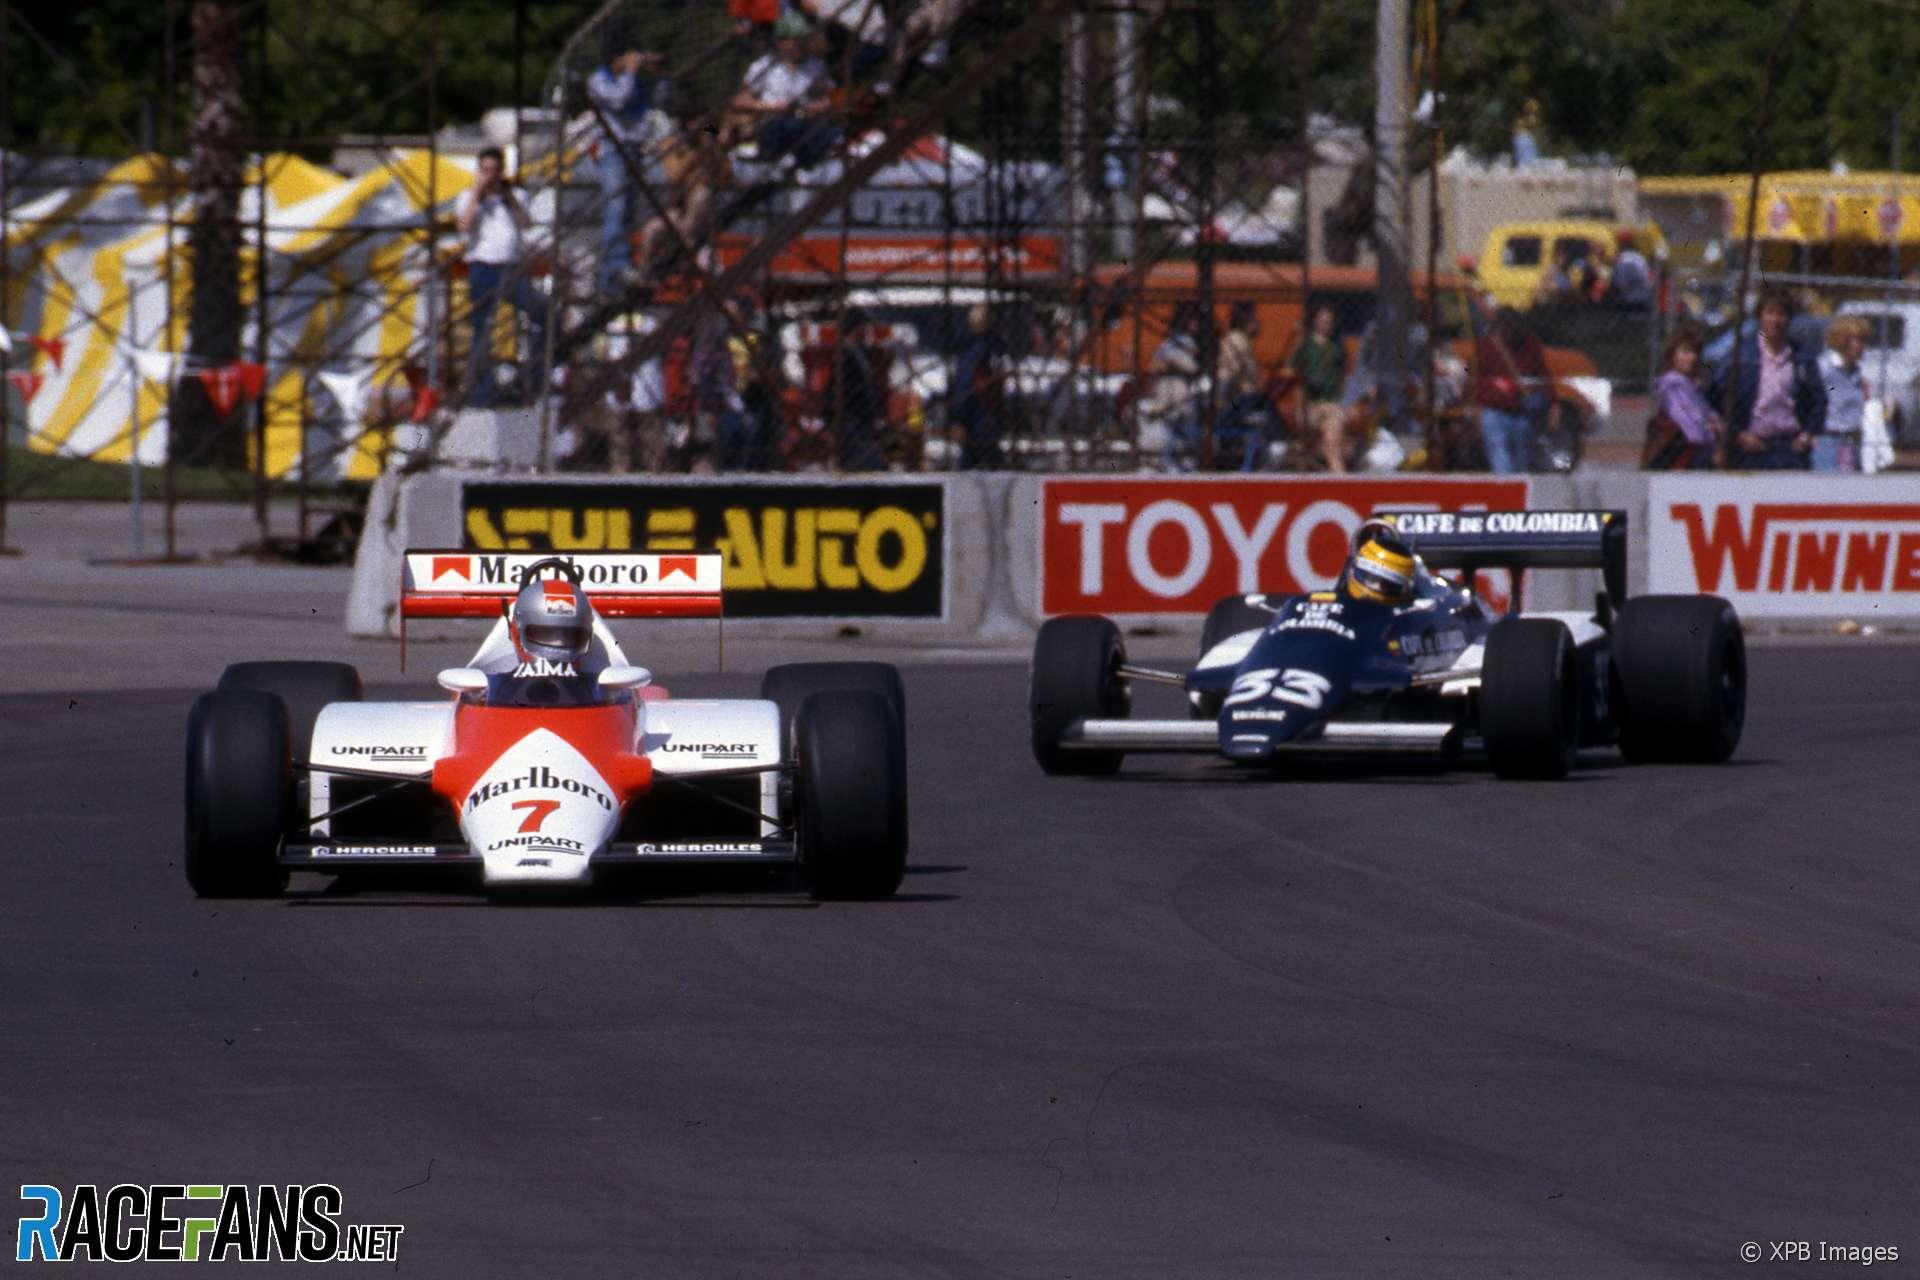 John Watson, McLaren, Roberto Guerrero, Theodore, Long Beach, 1983